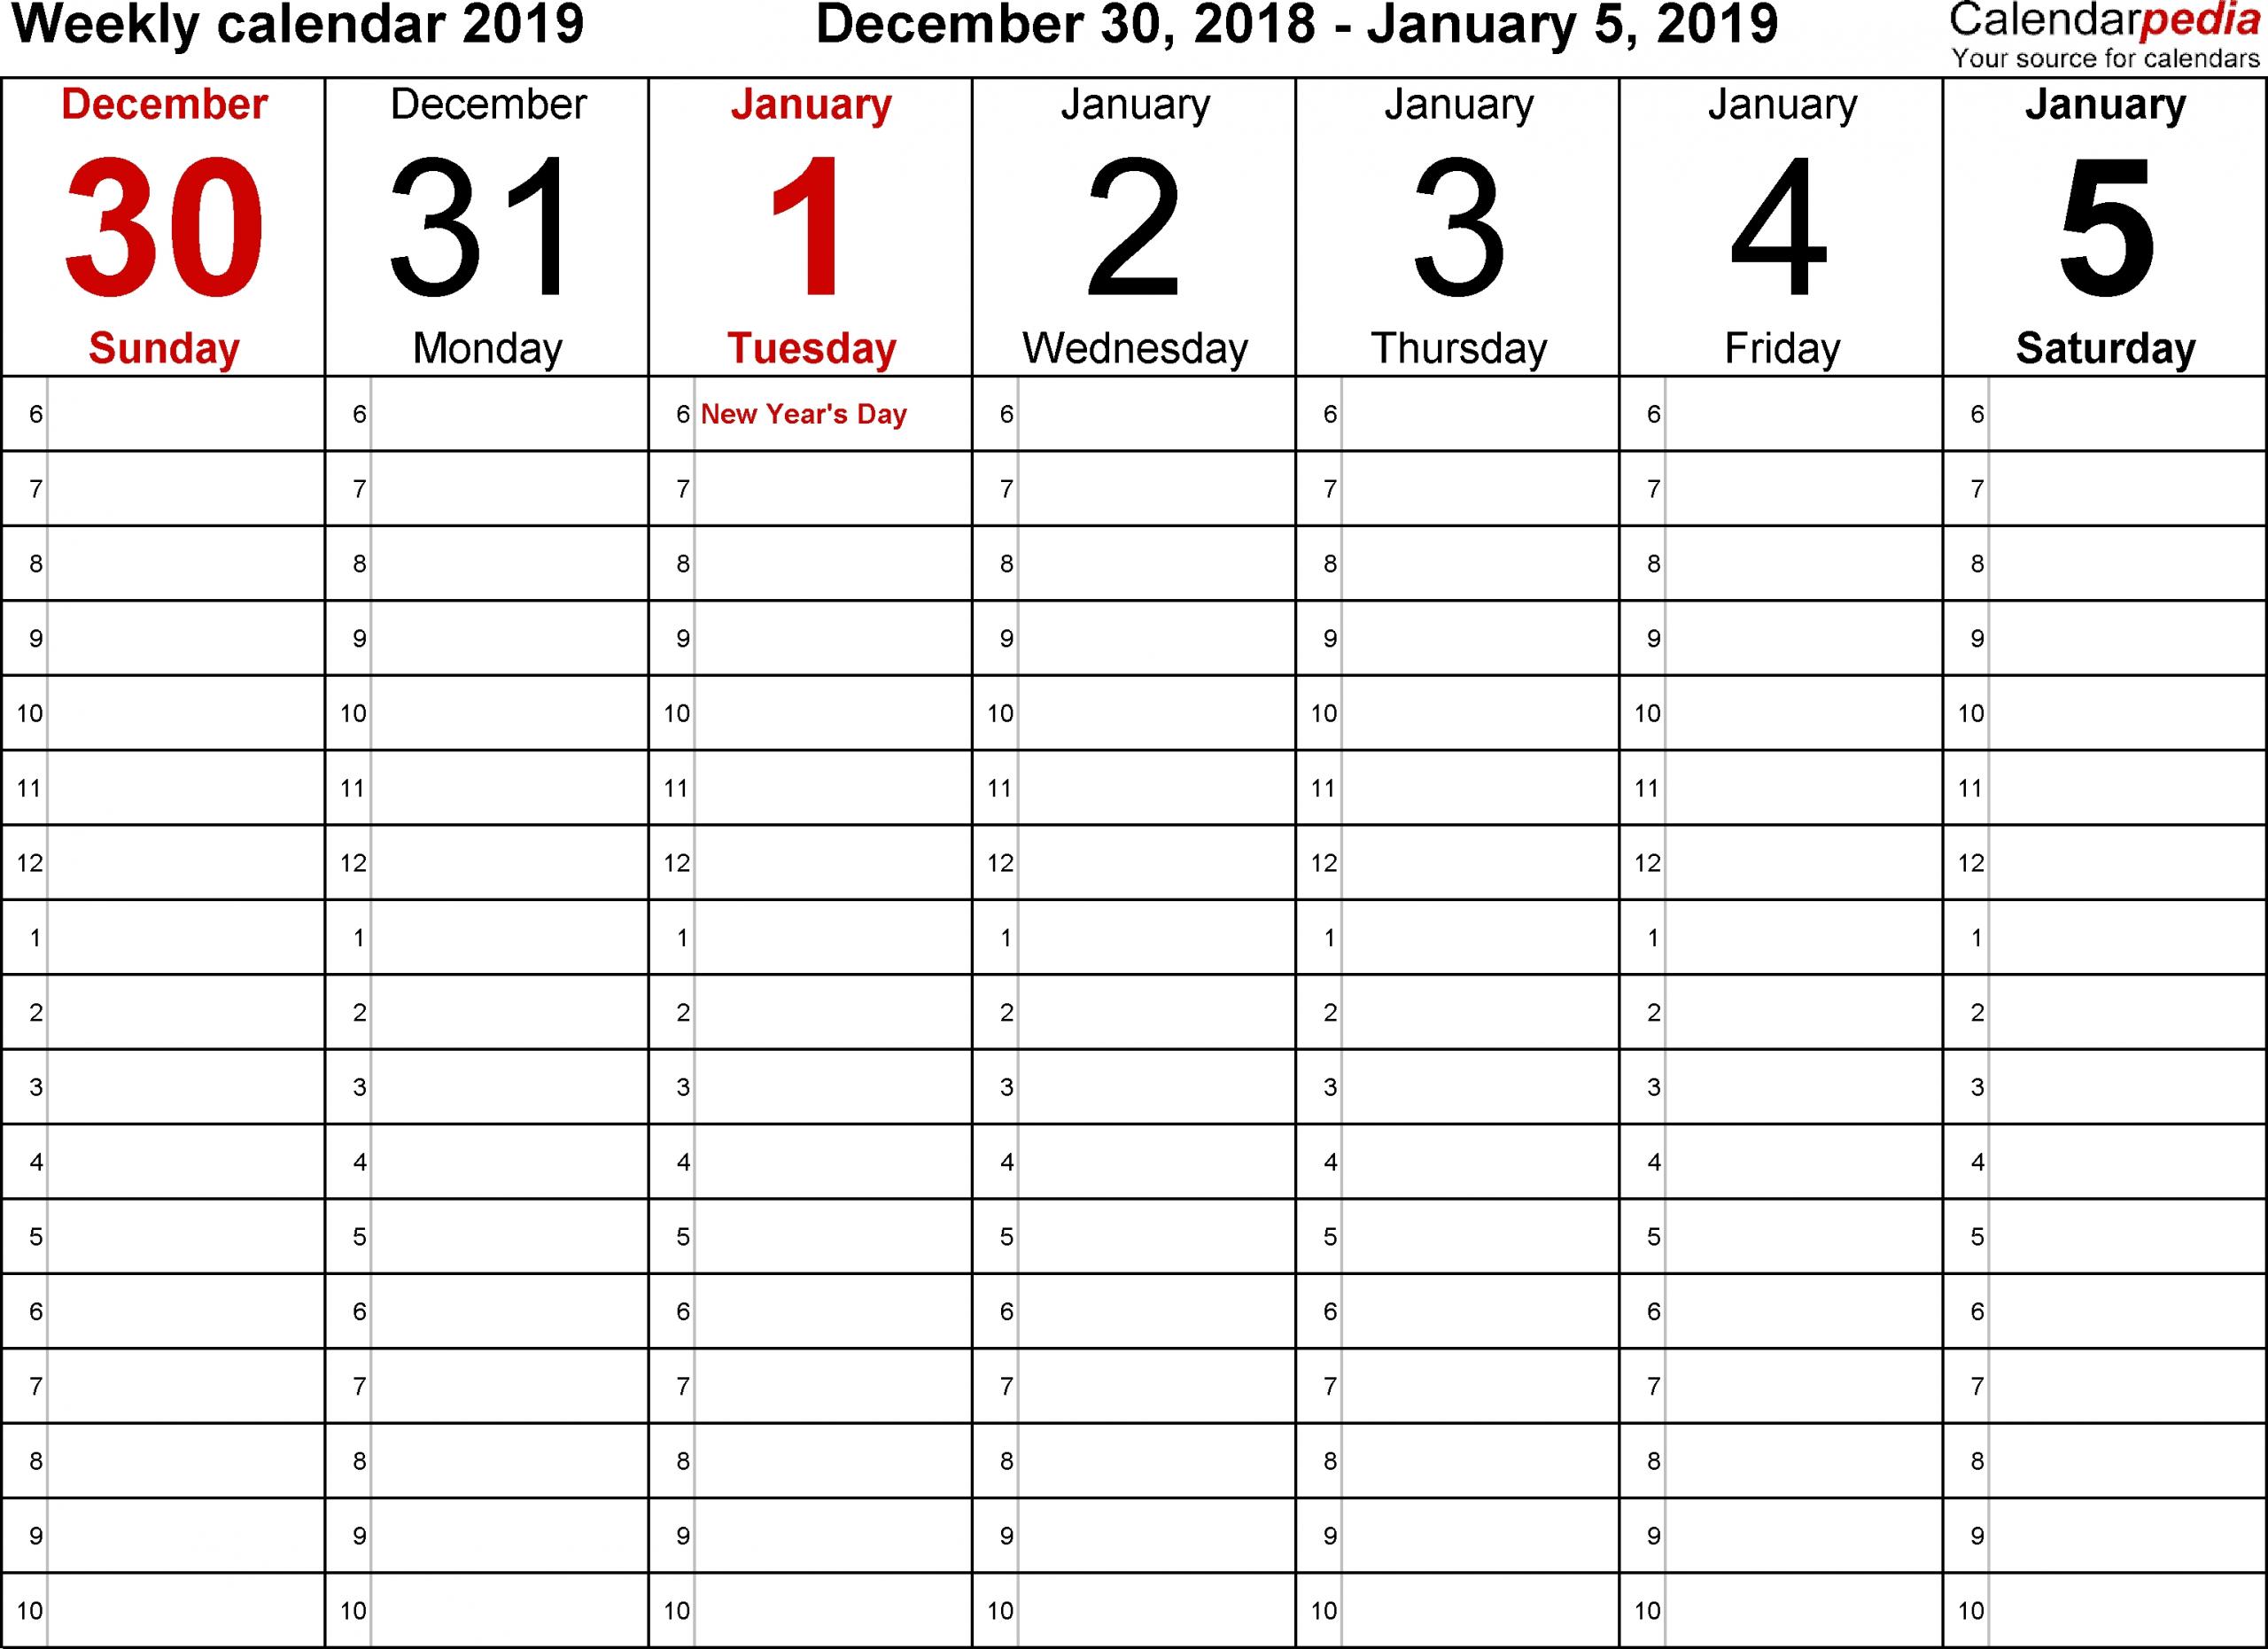 Free Printable 30 Day Calendars – Calendar Inspiration Design 30 Day Printable Calender